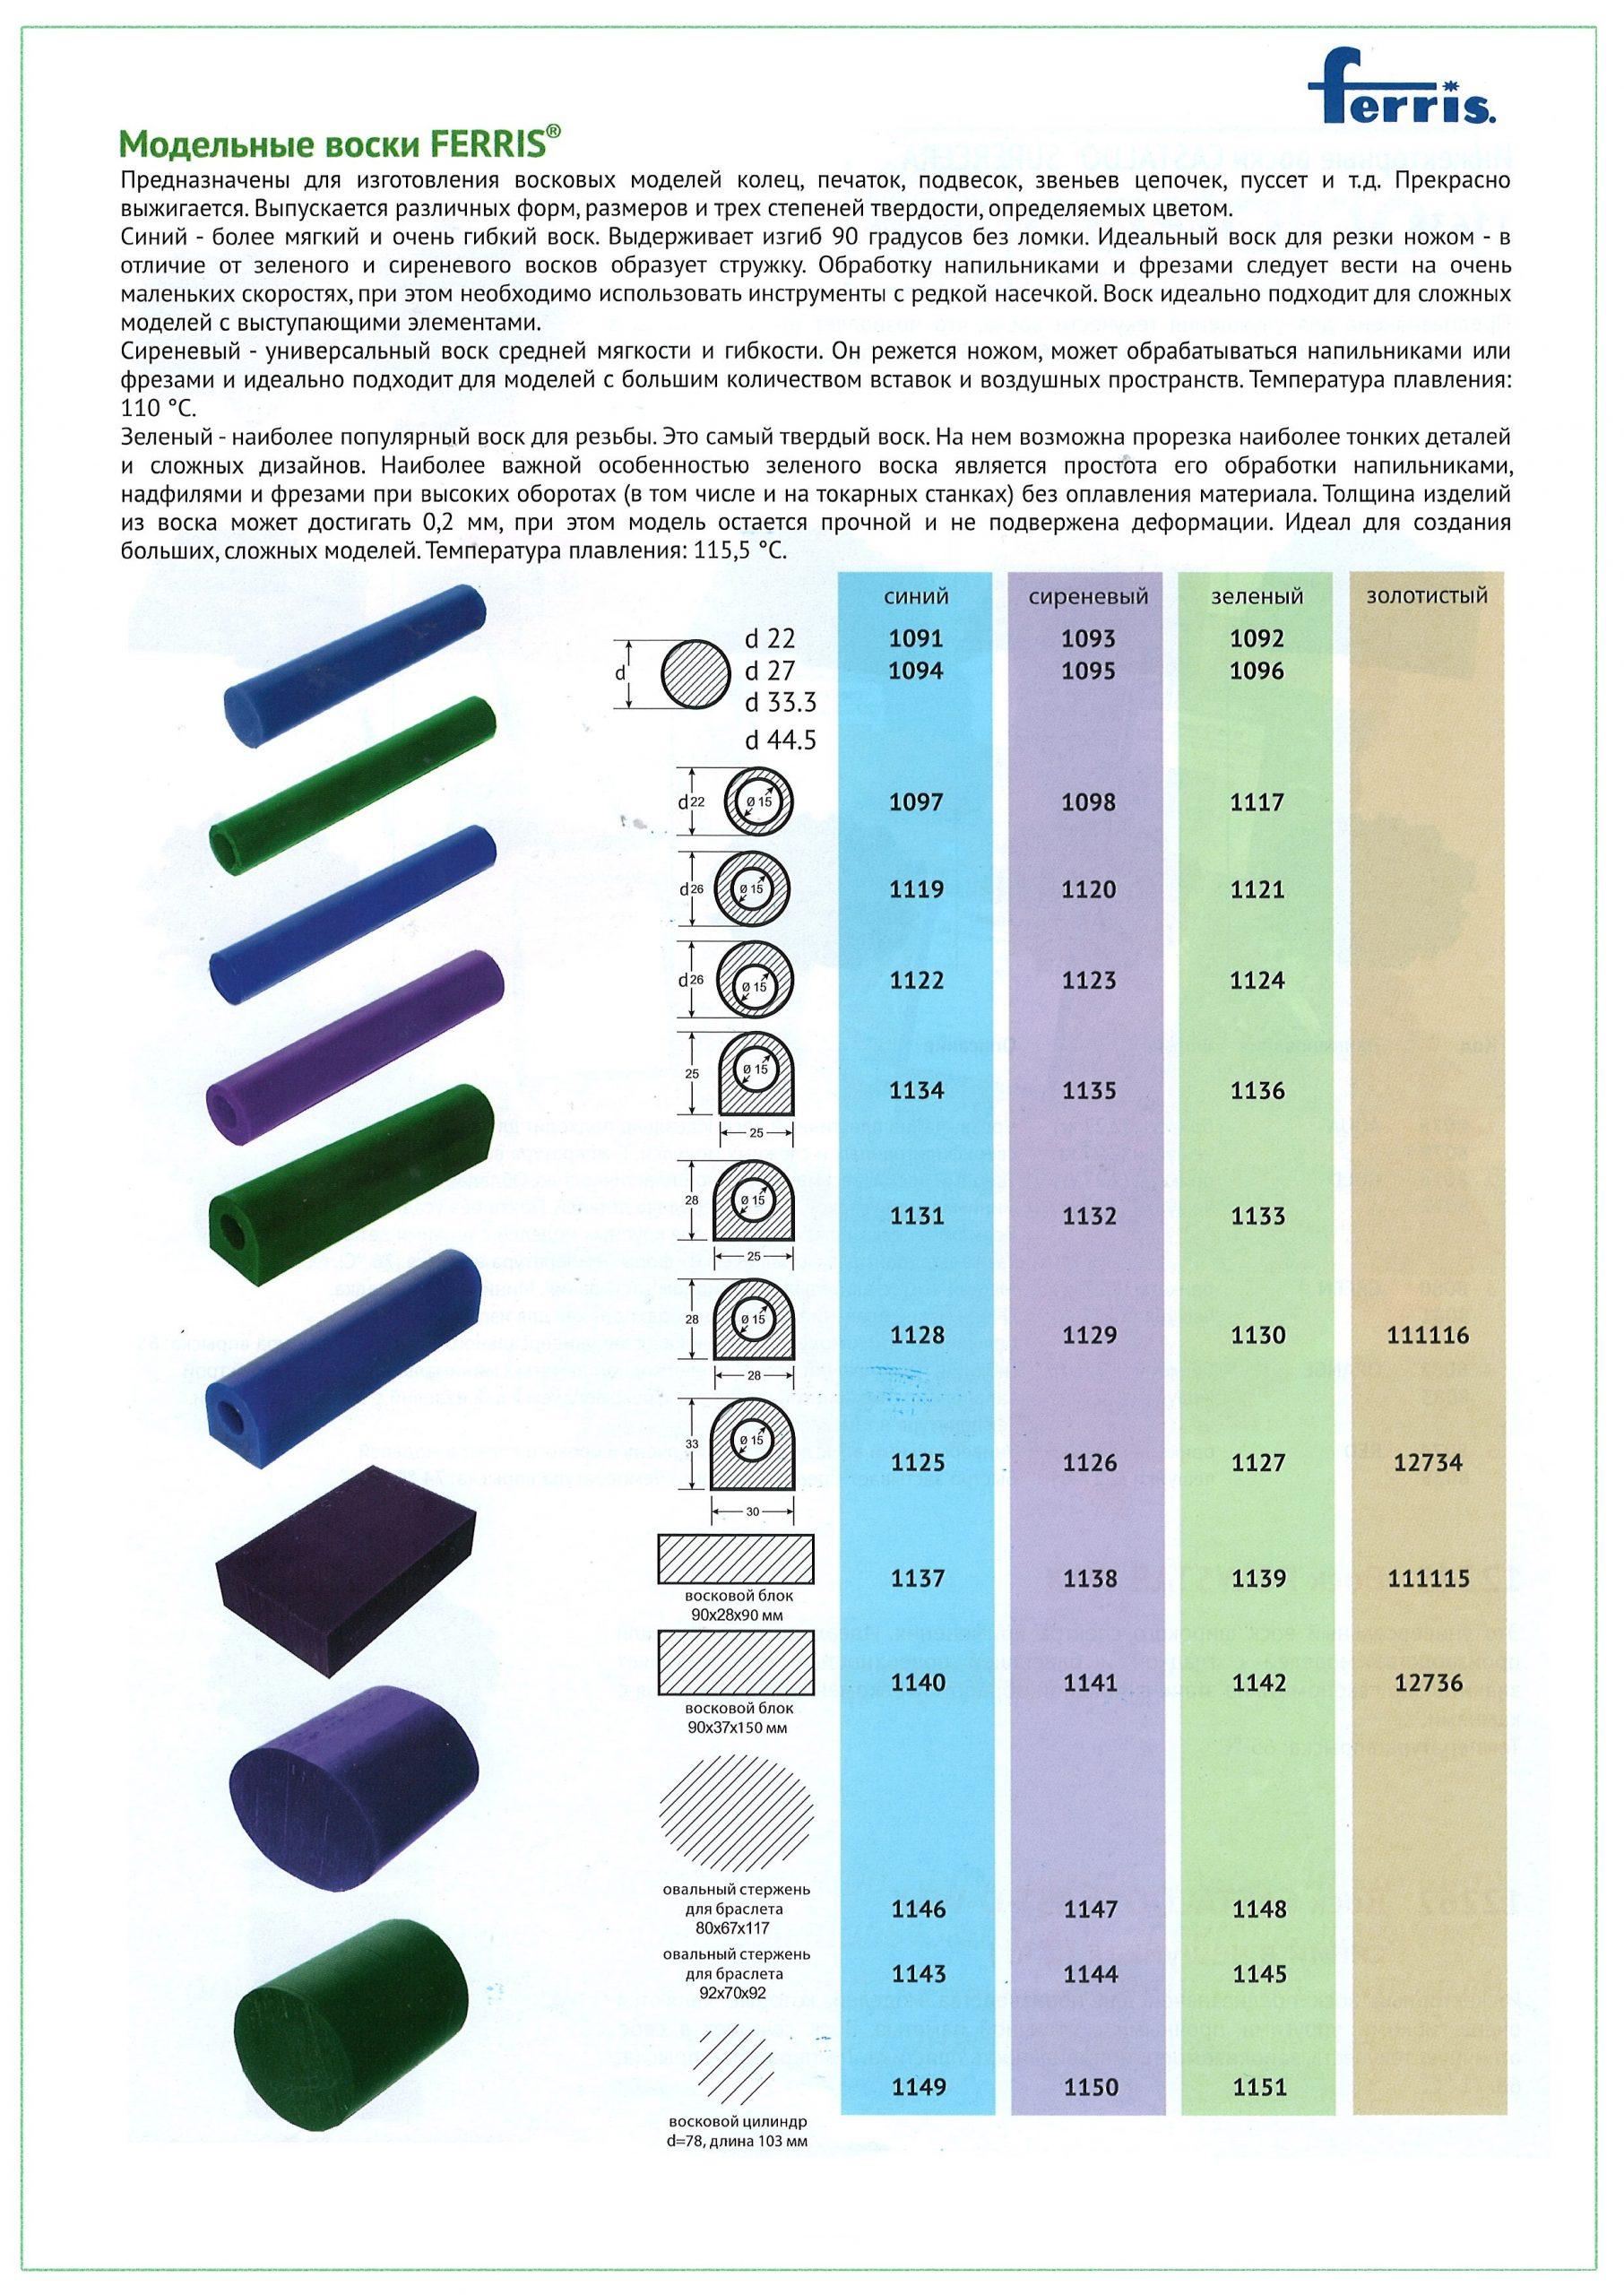 Воск модельный FERRIS FILE-A синий брусок (90х150х37мм), 454 гр